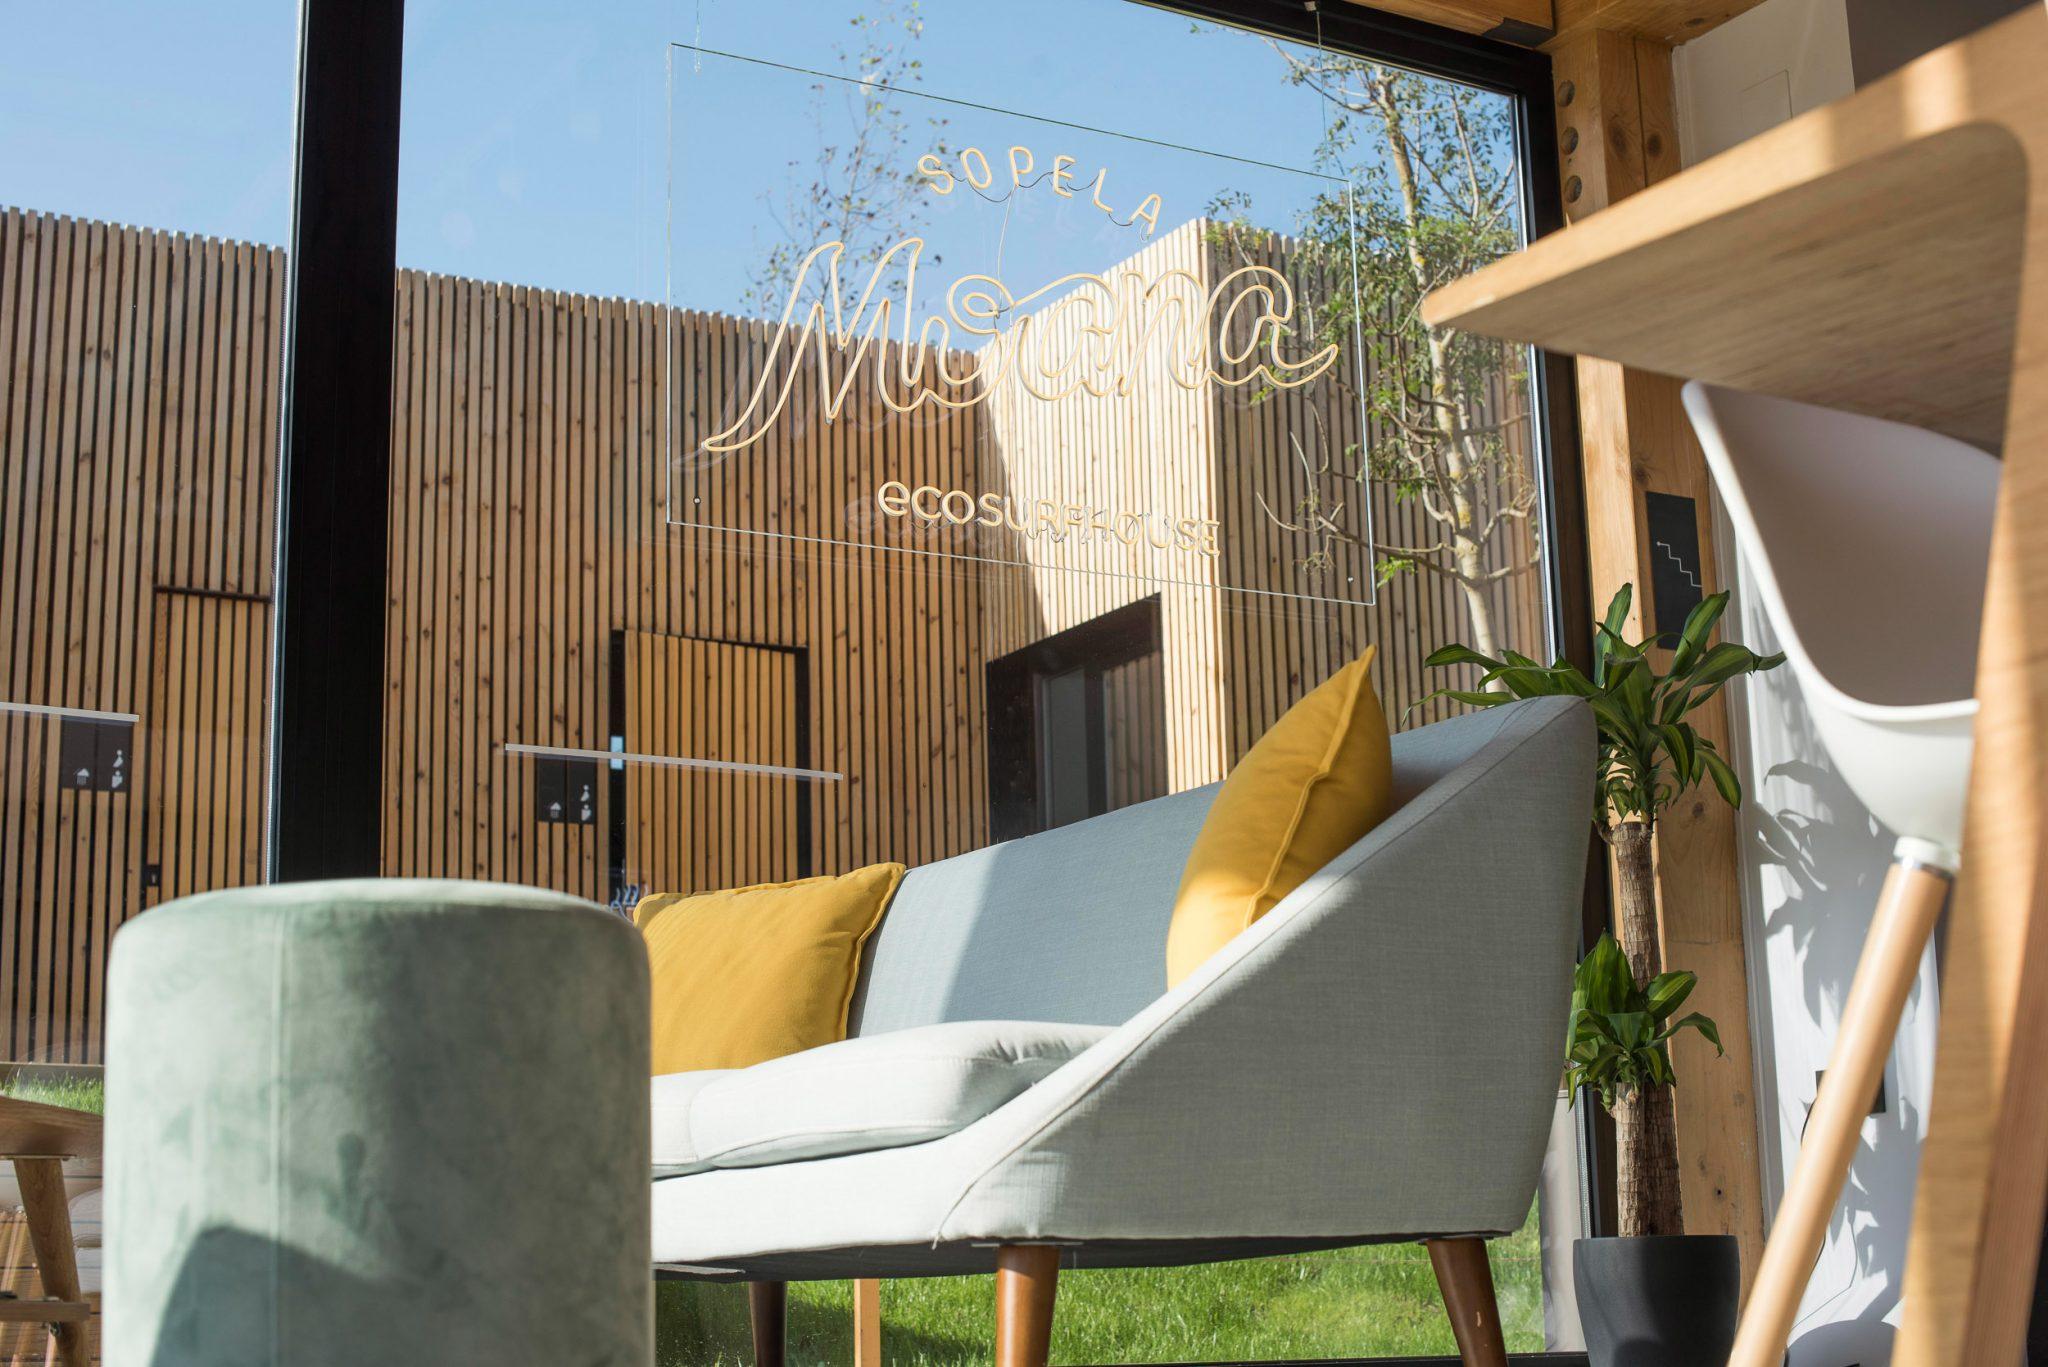 Pure-Surfcamps-Eco-Surfcamp-Bilbao-Loungebereich_